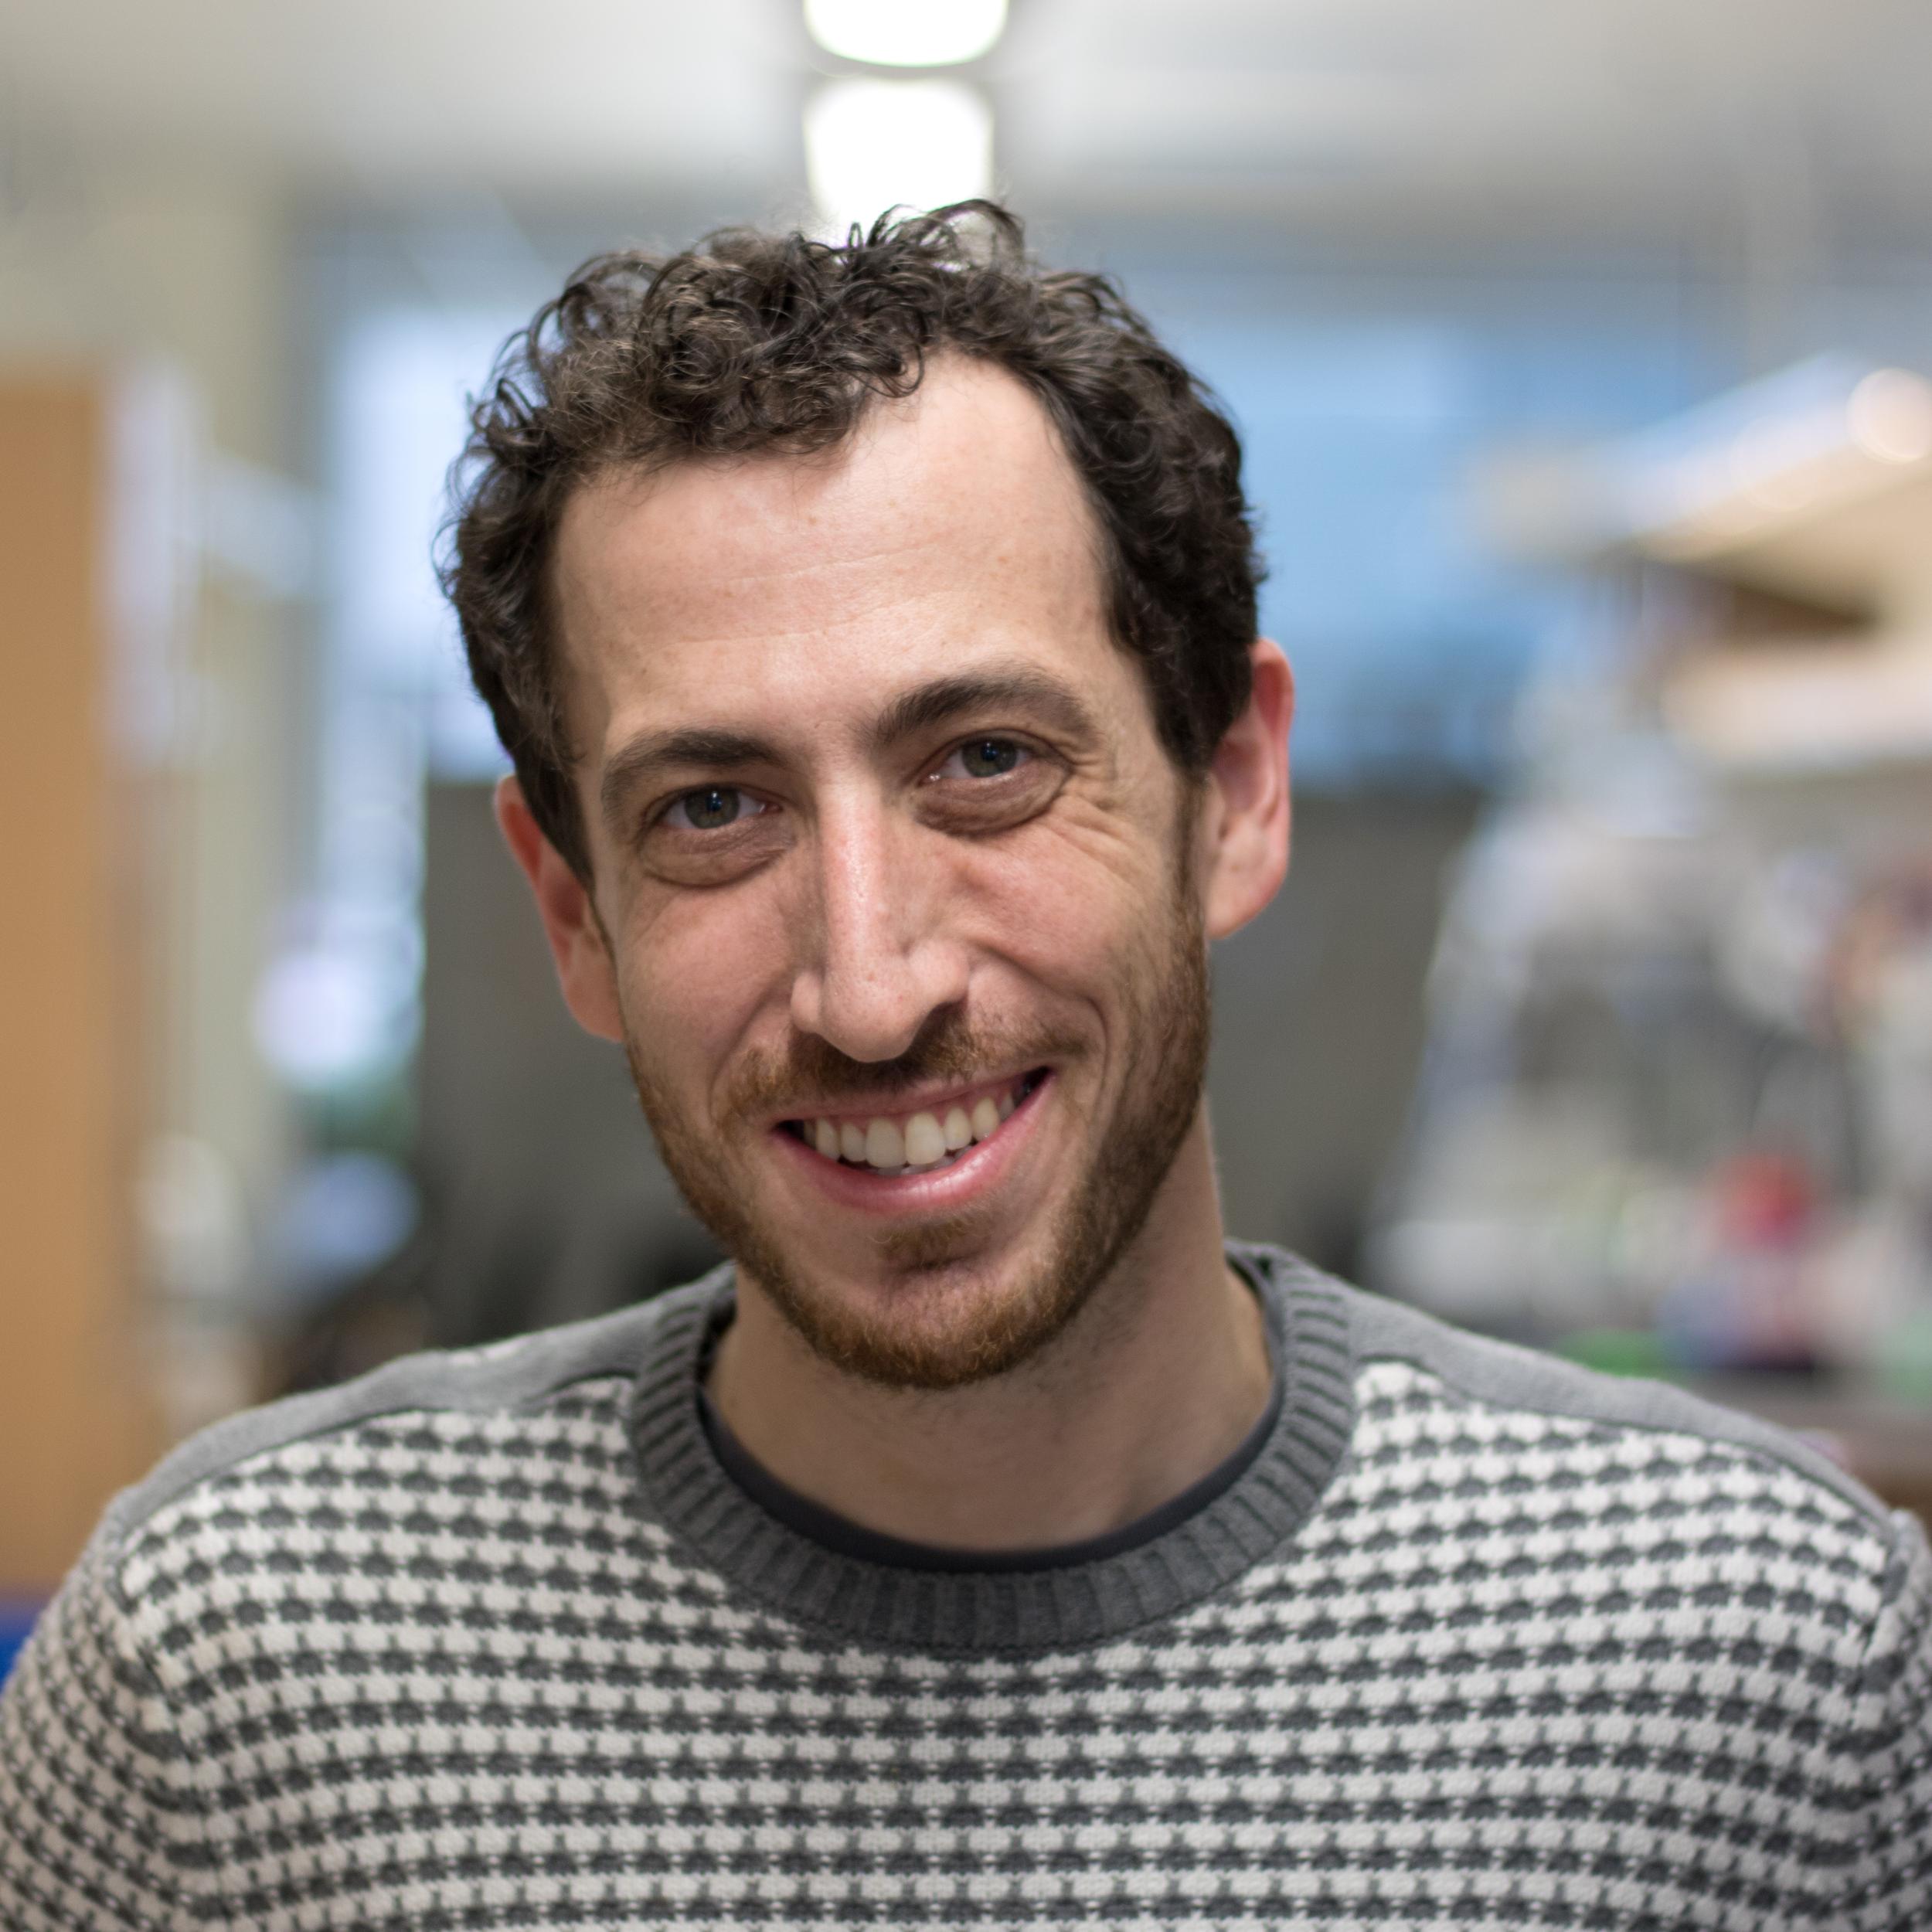 Bert Berla, PhD  (2015-2016) Research Scientist II Elemental Enzymes  bert [at] elementalenzymes.com